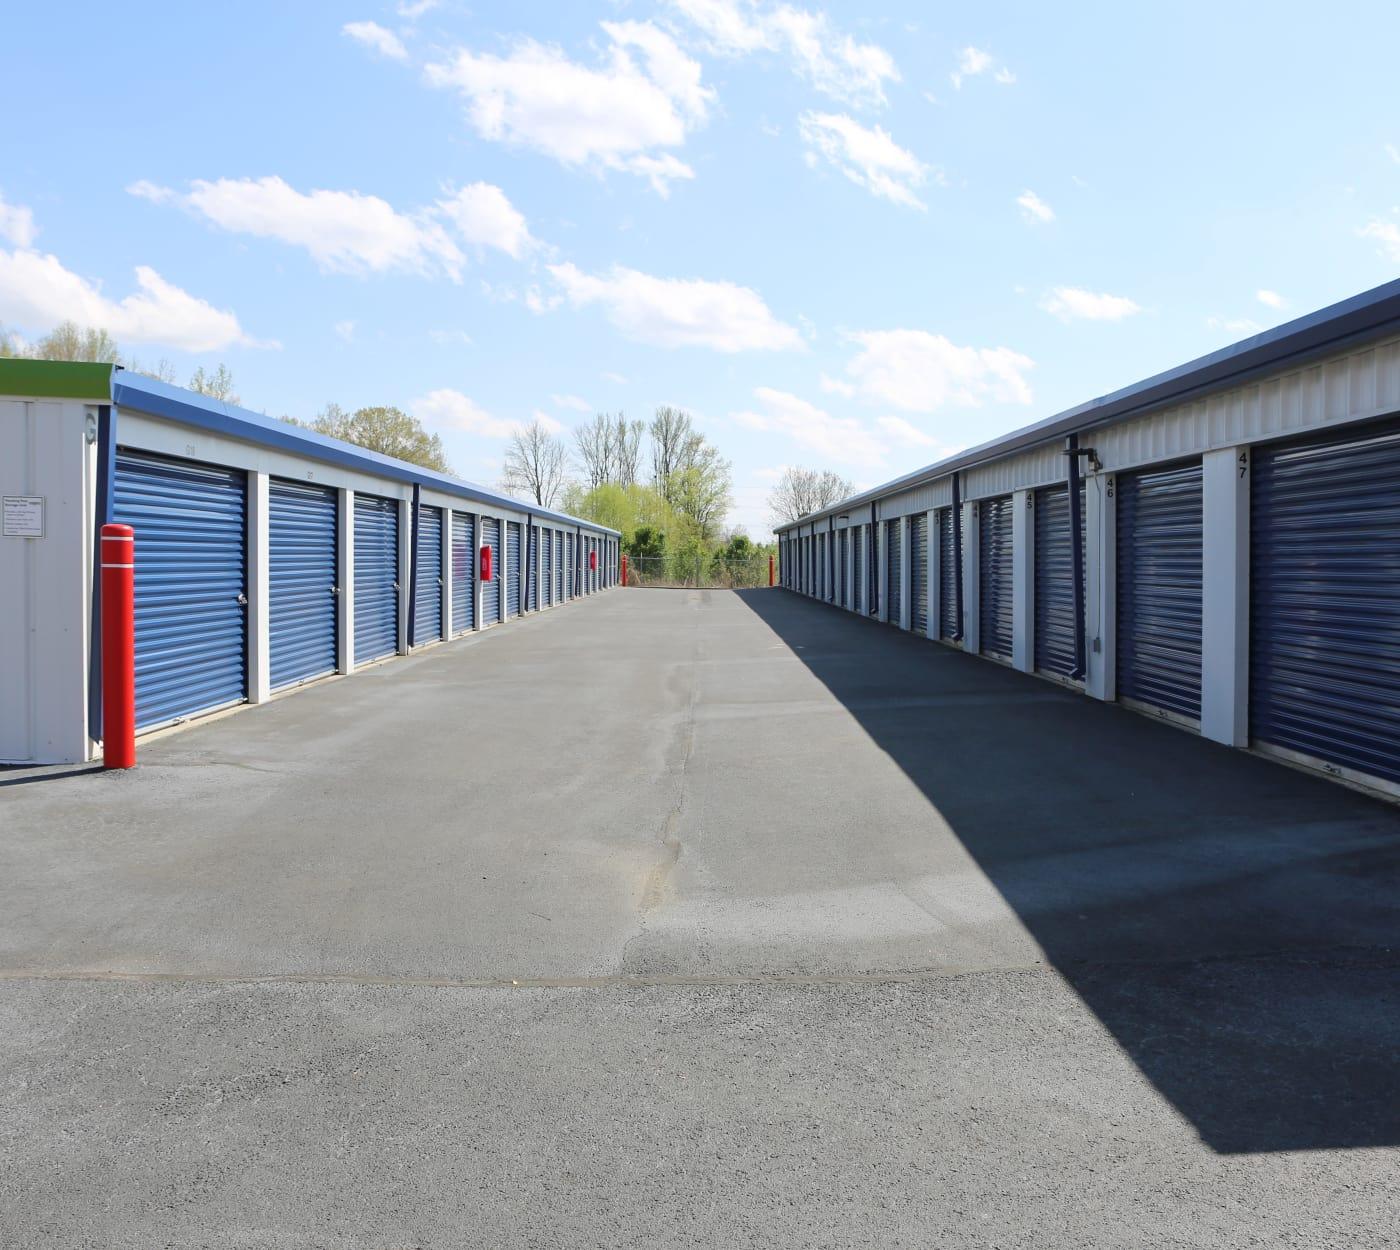 Ground-floor units at Midgard Self Storage in Florence, Alabama